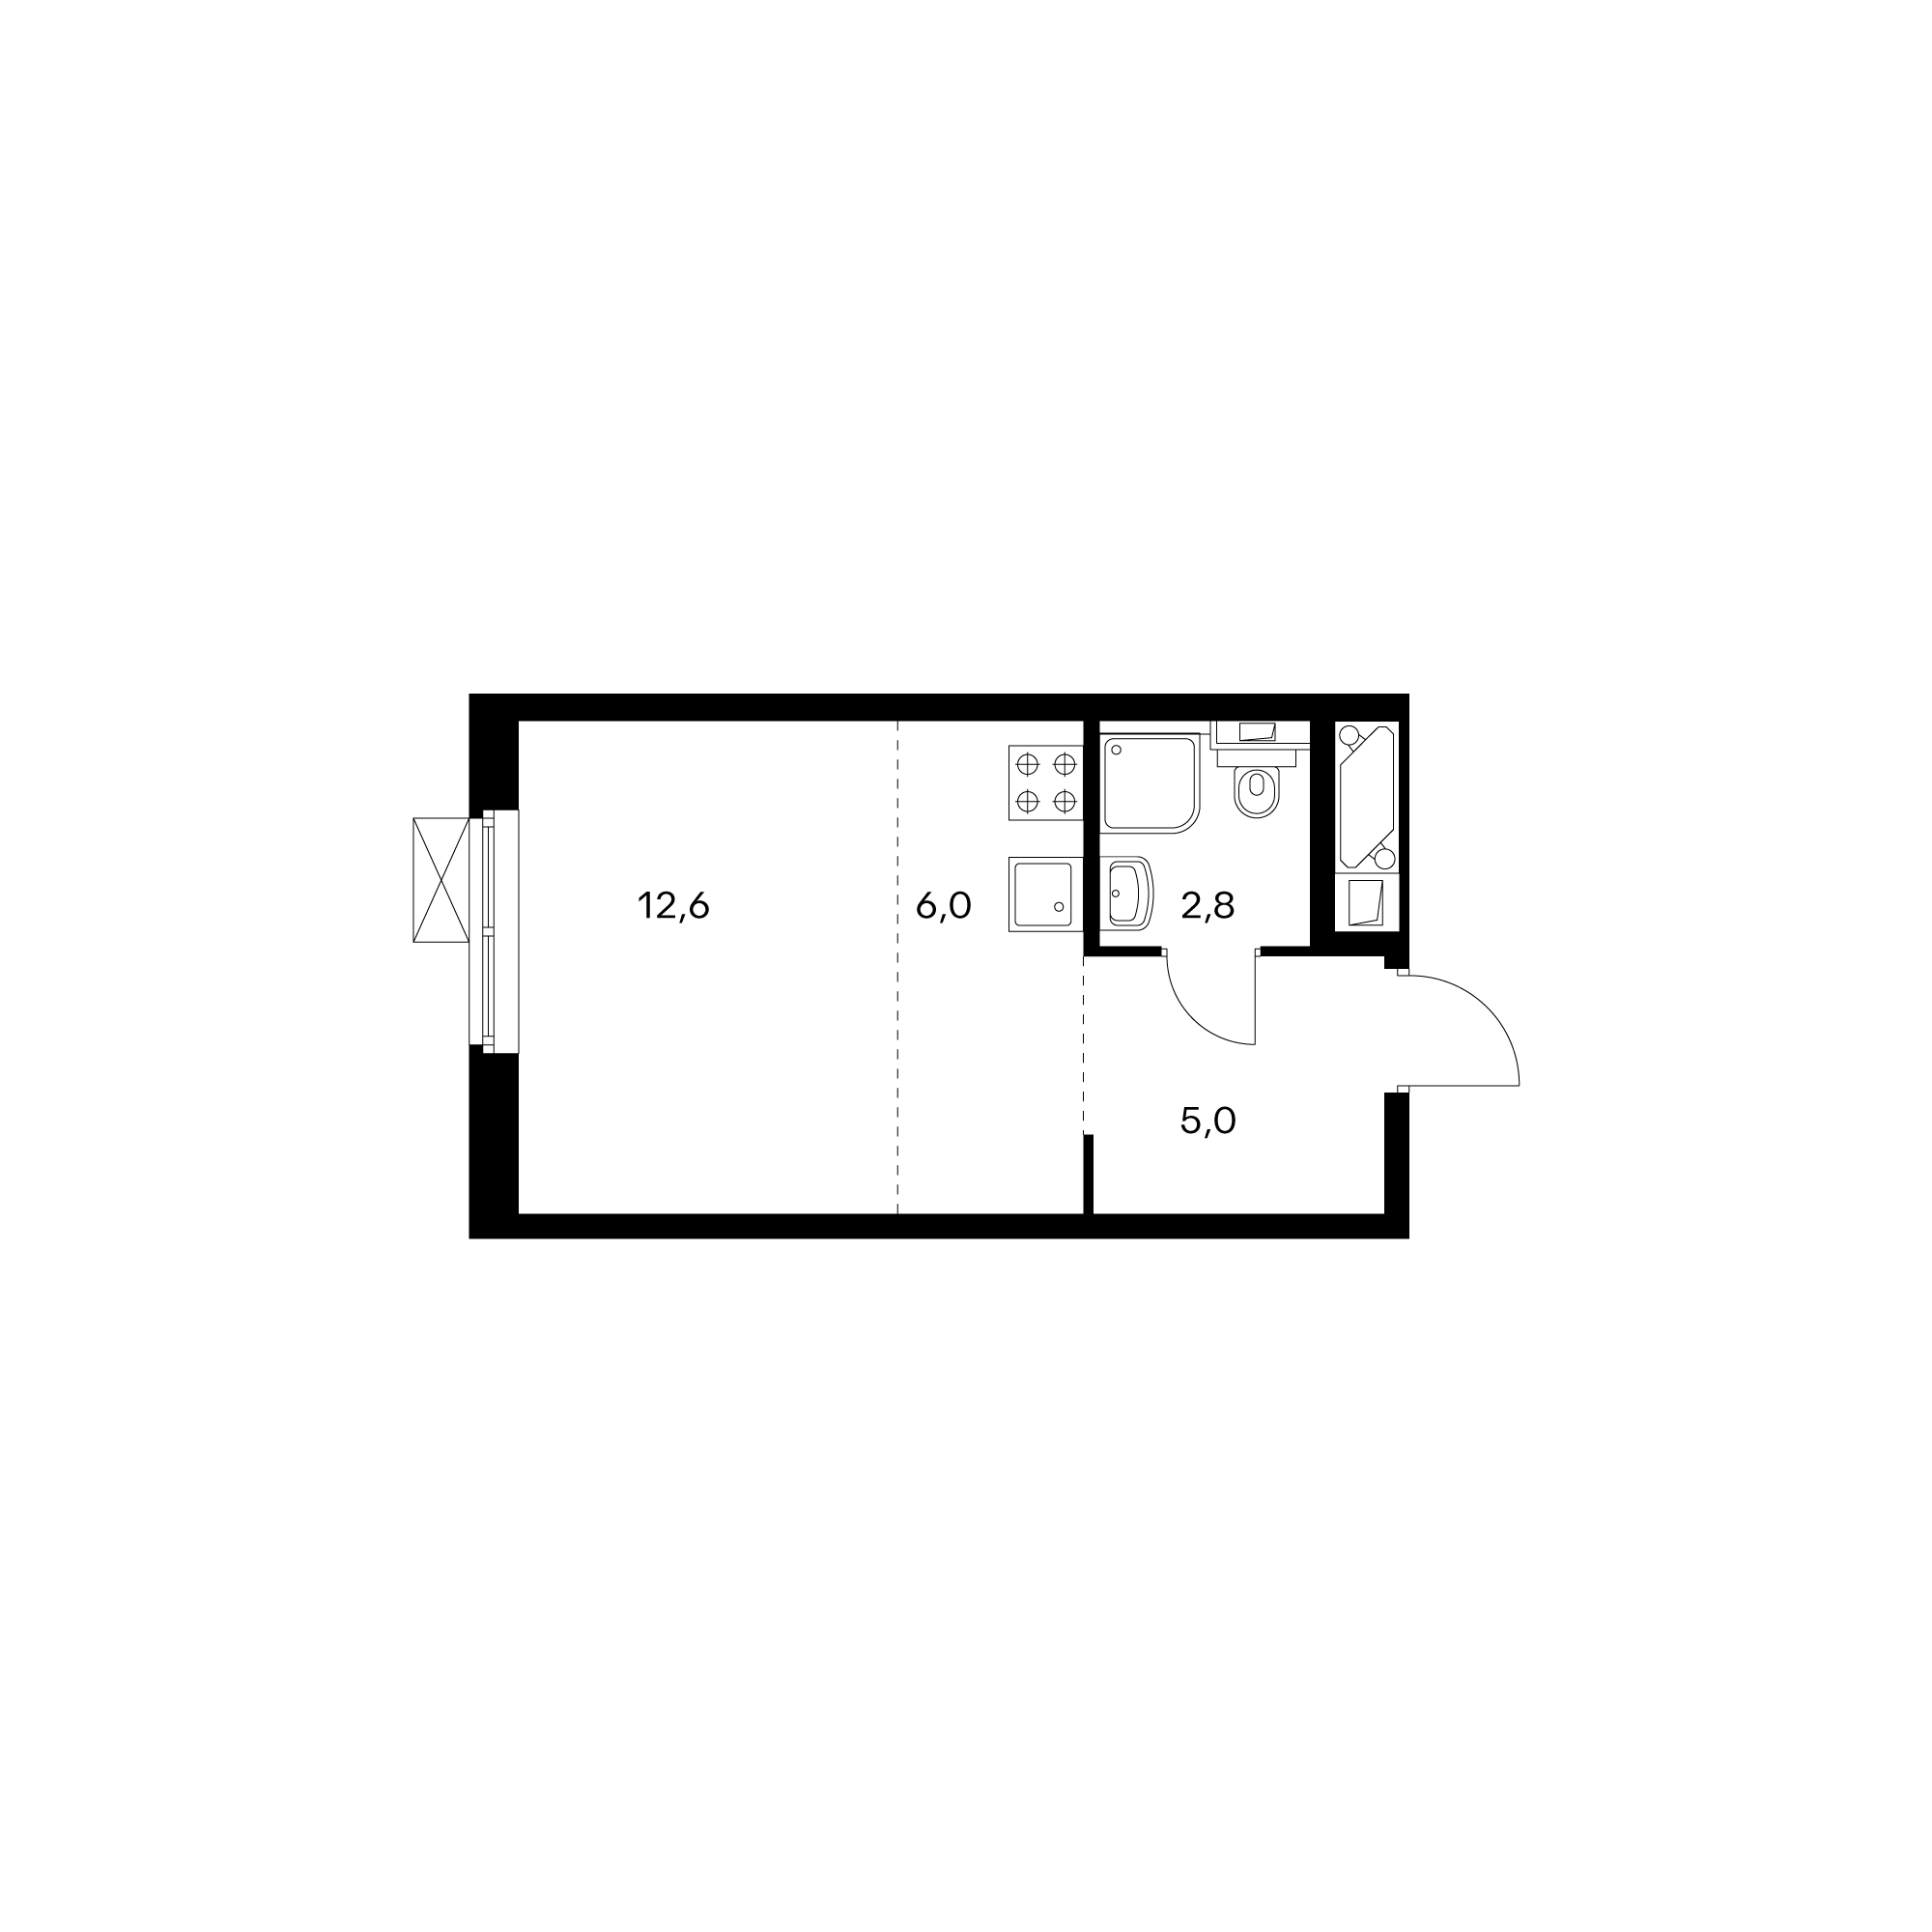 1NM1-2